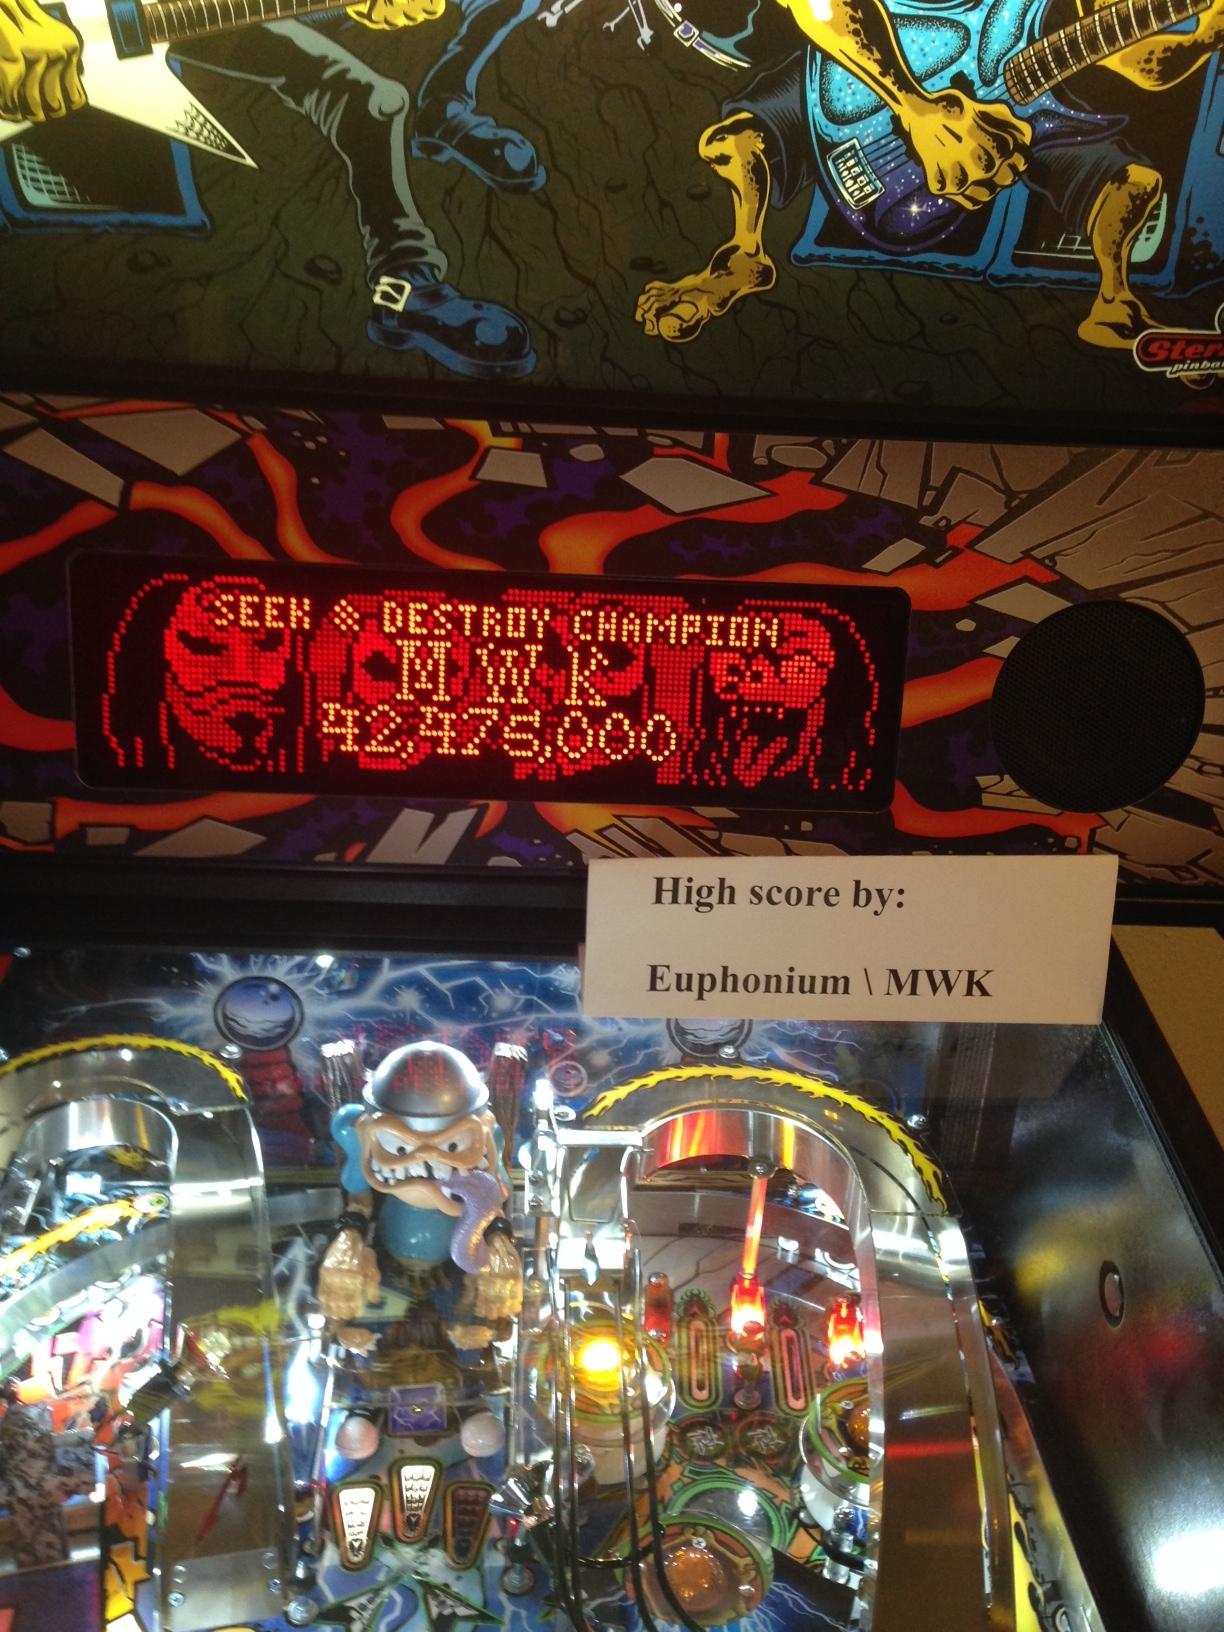 euphonium: Metallica: Seek & Destroy Champion (Pinball Bonus Mode) 42,475,000 points on 2016-07-12 01:04:30